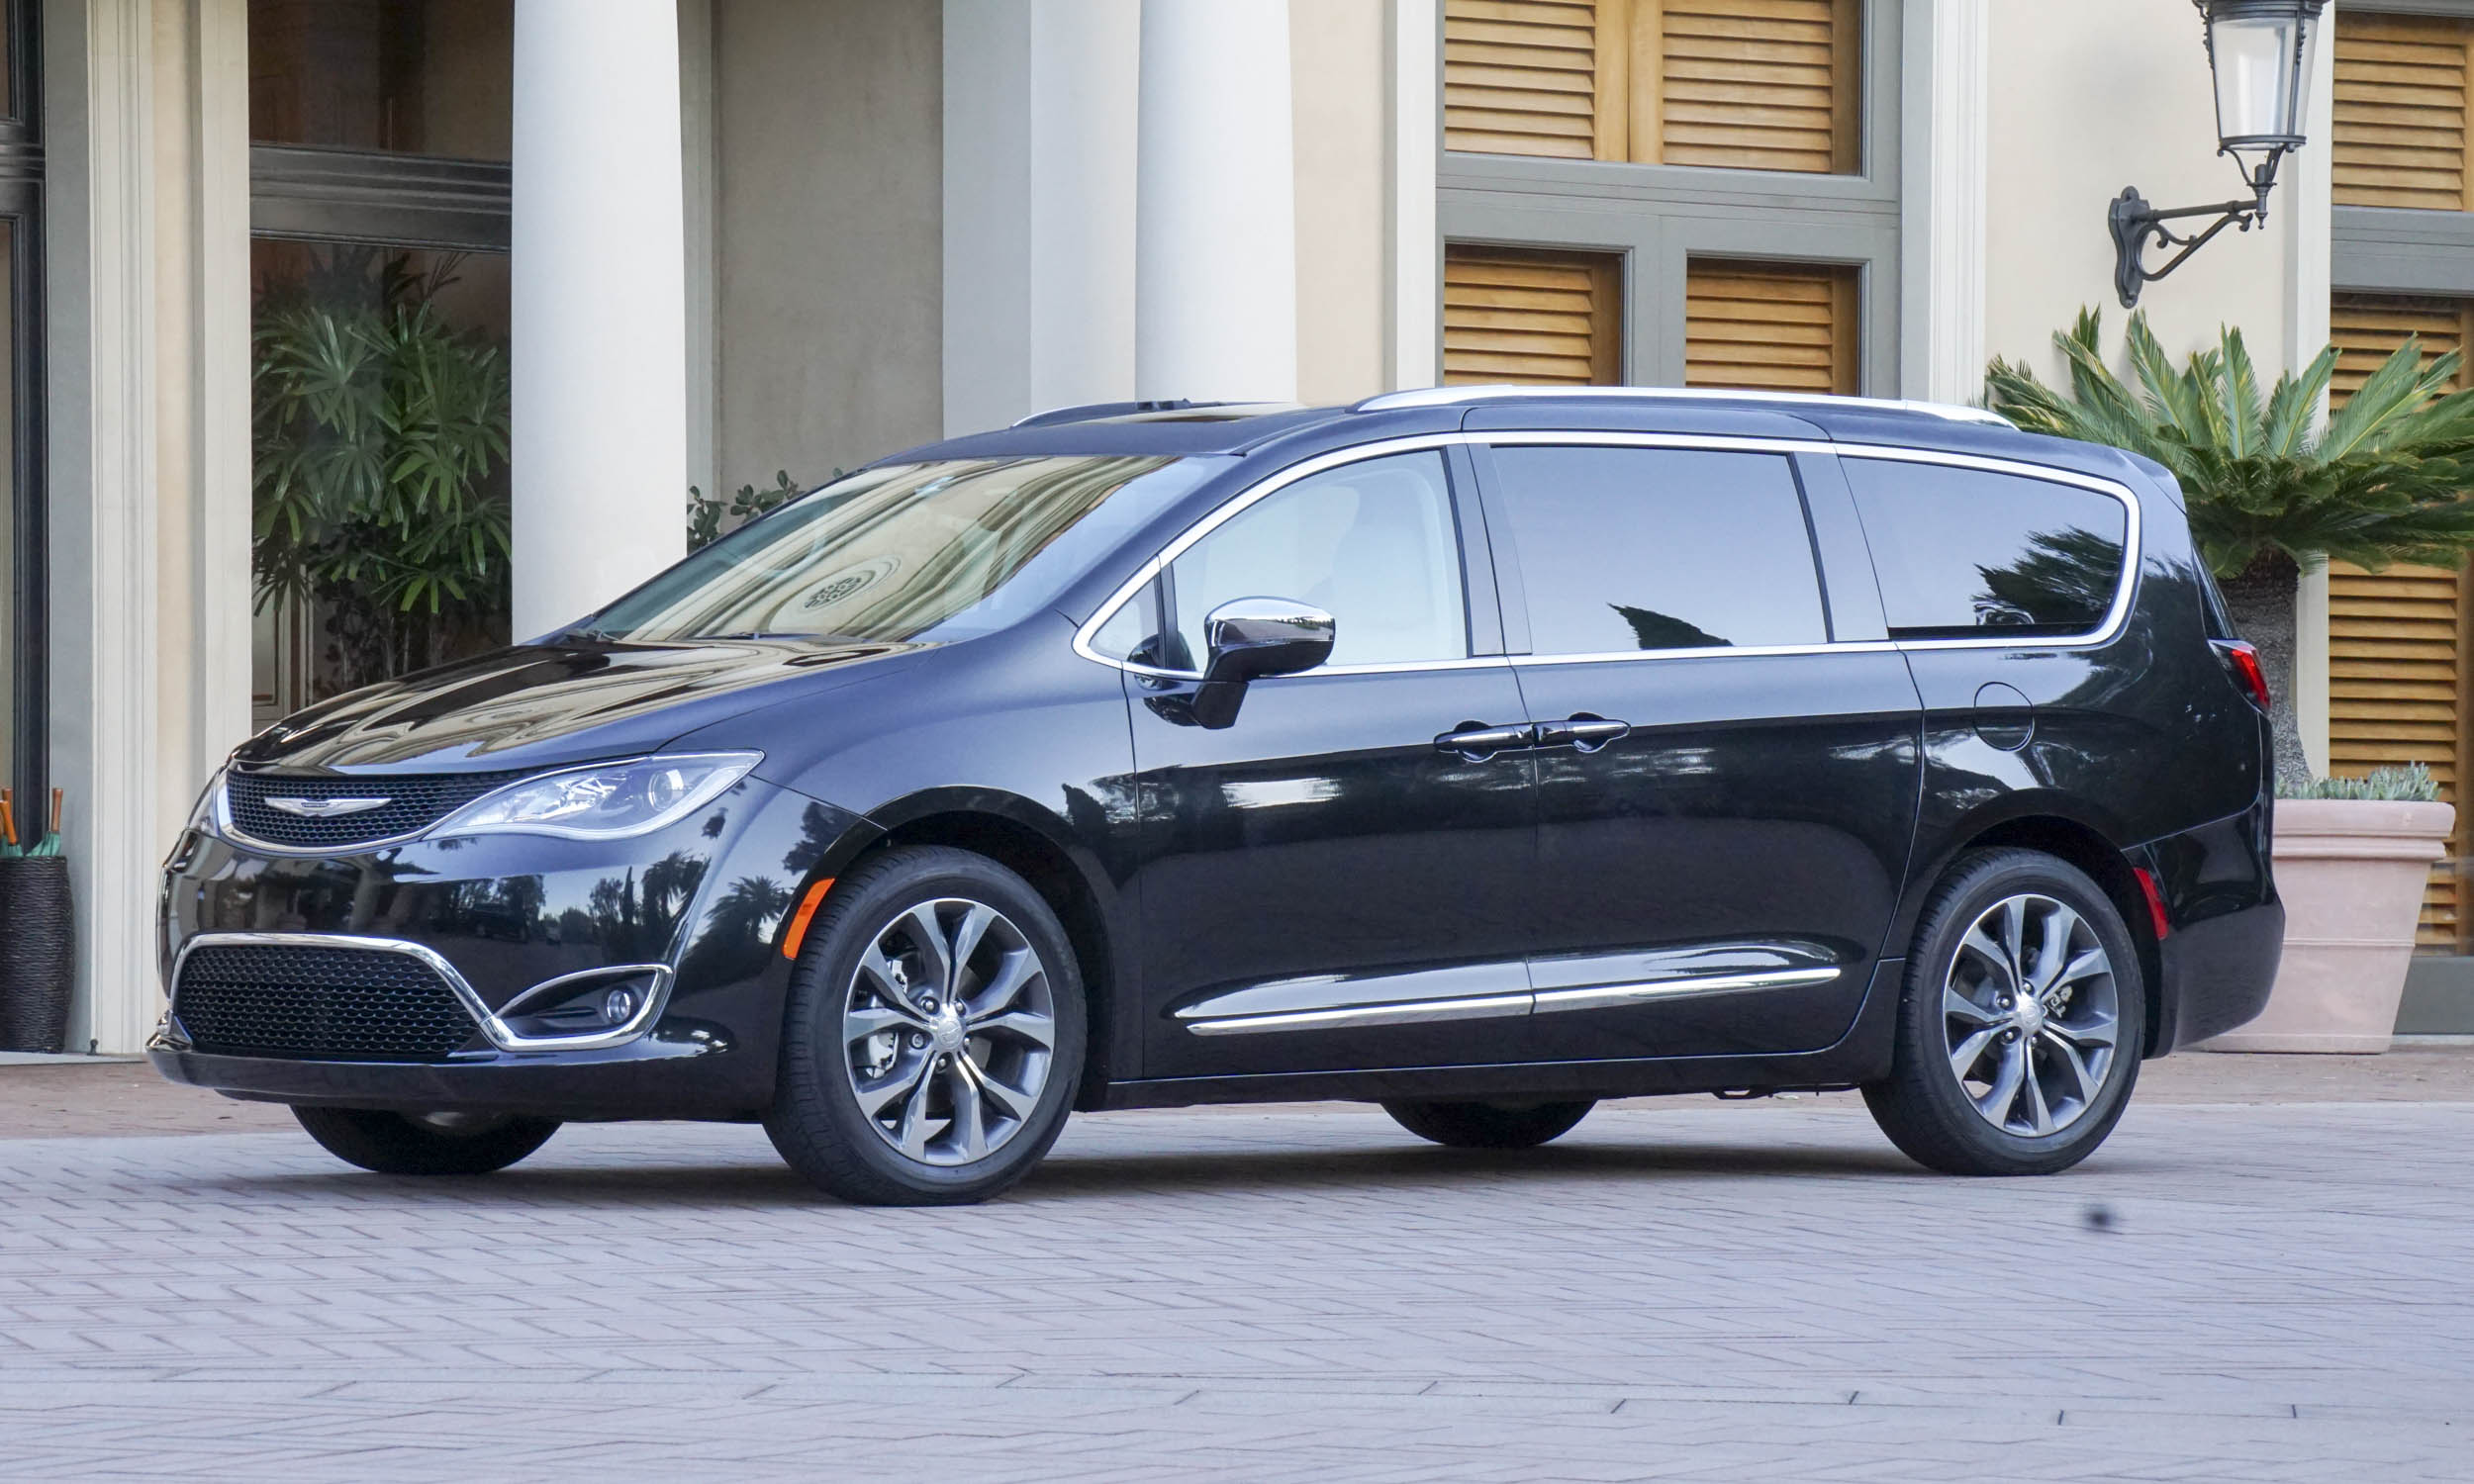 Excellent 2017 Chrysler Pacifica First Drive Review  AutoNXT